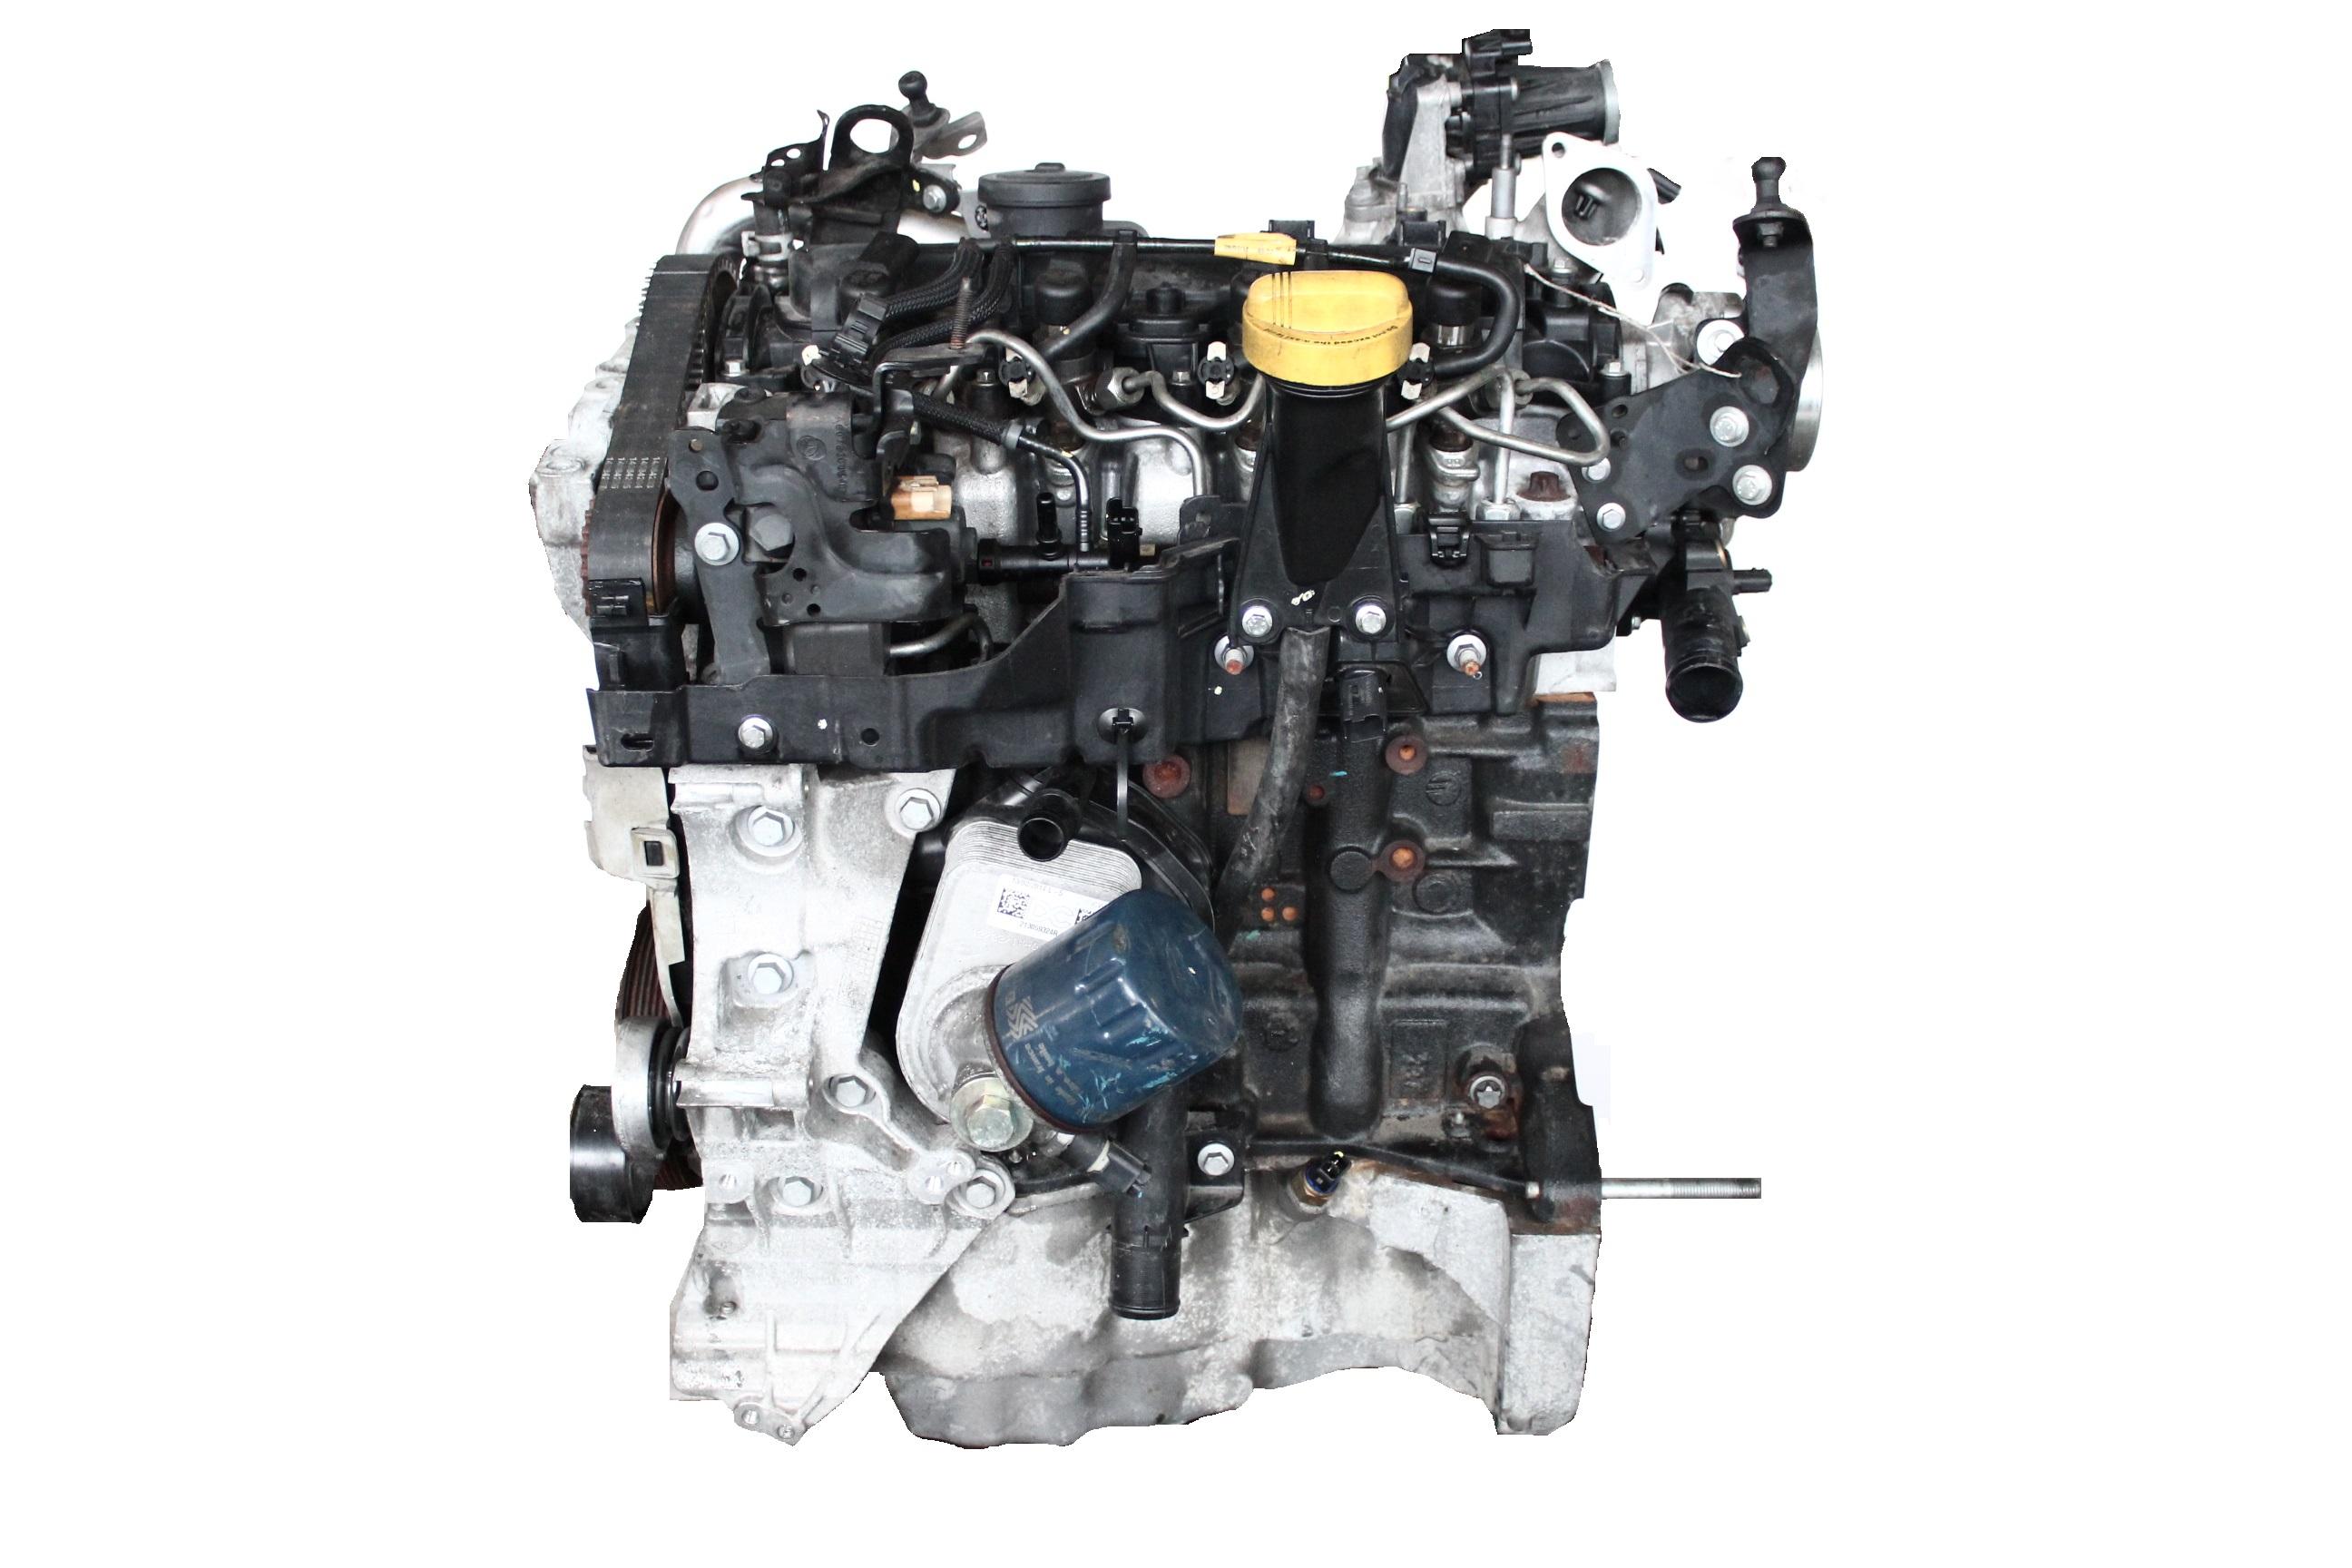 Motor 2014 für Nissan Renault Juke NV200 Qashqai Kangoo 1,5 dCi Diesel K9K636 K9K